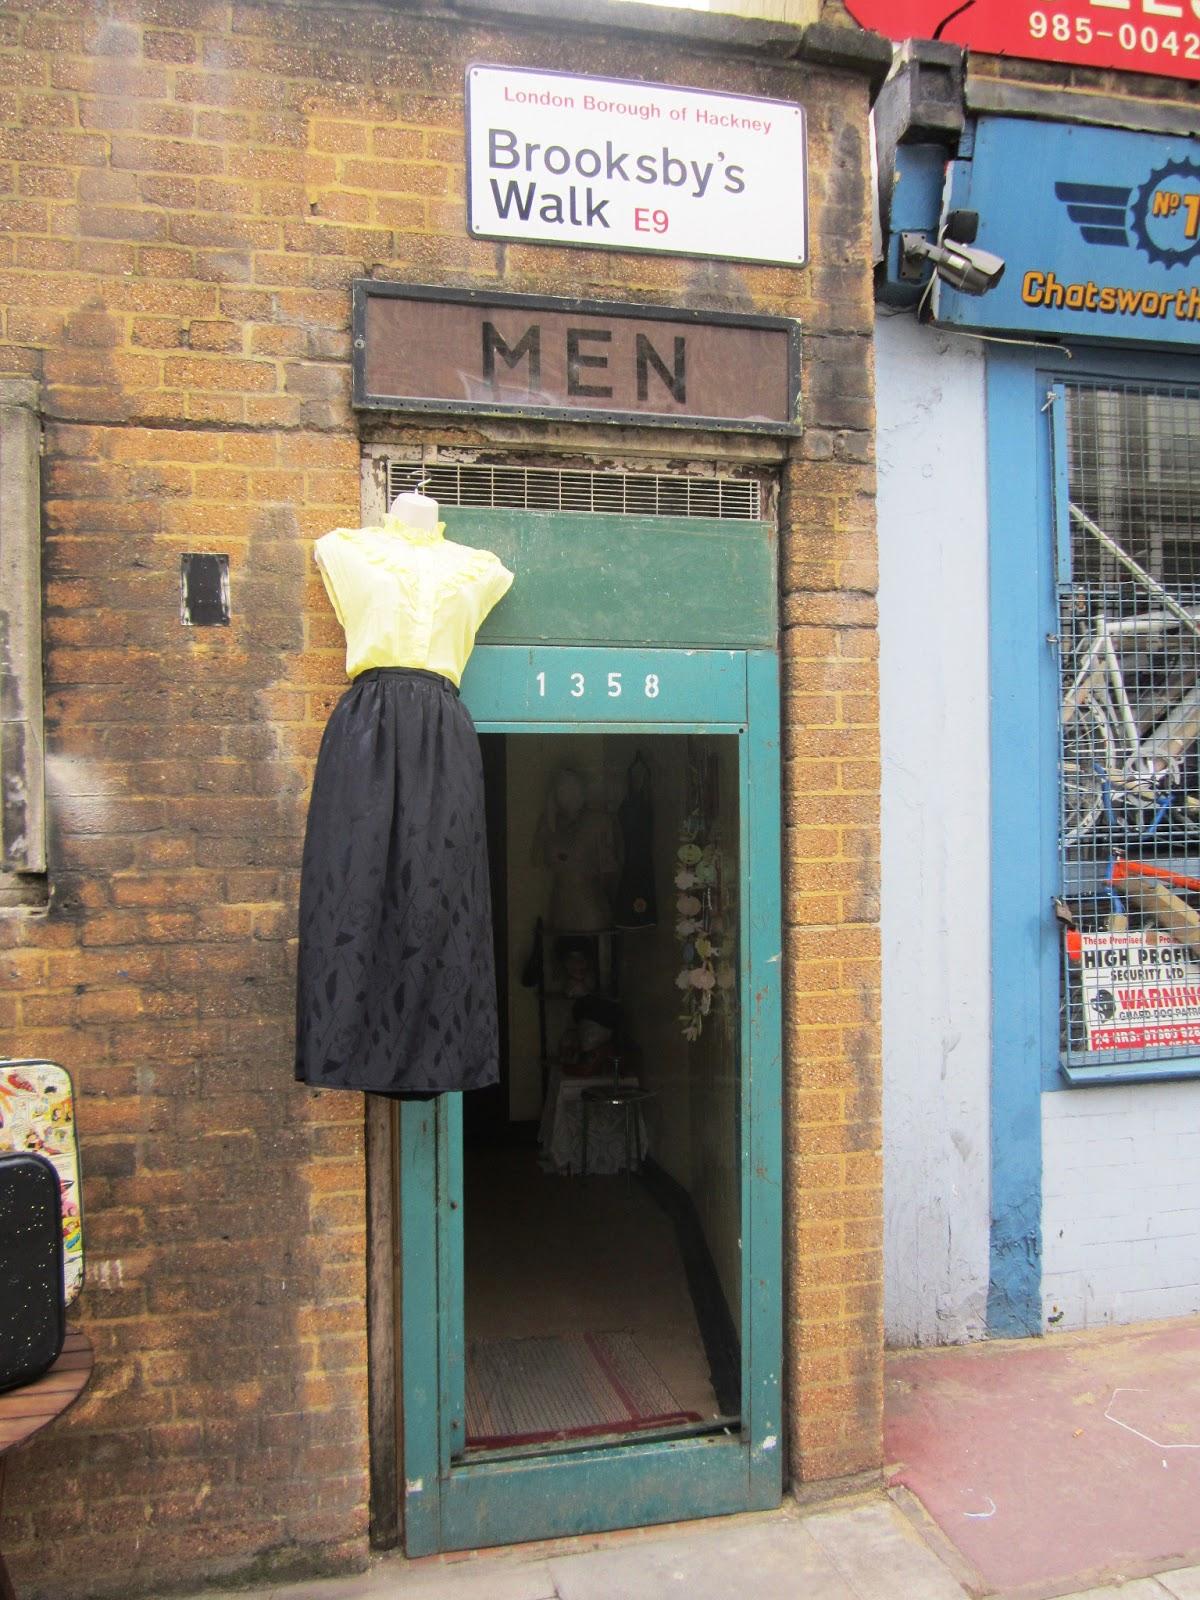 http://ilovemarkets.co.uk/listing/olivias-closet/